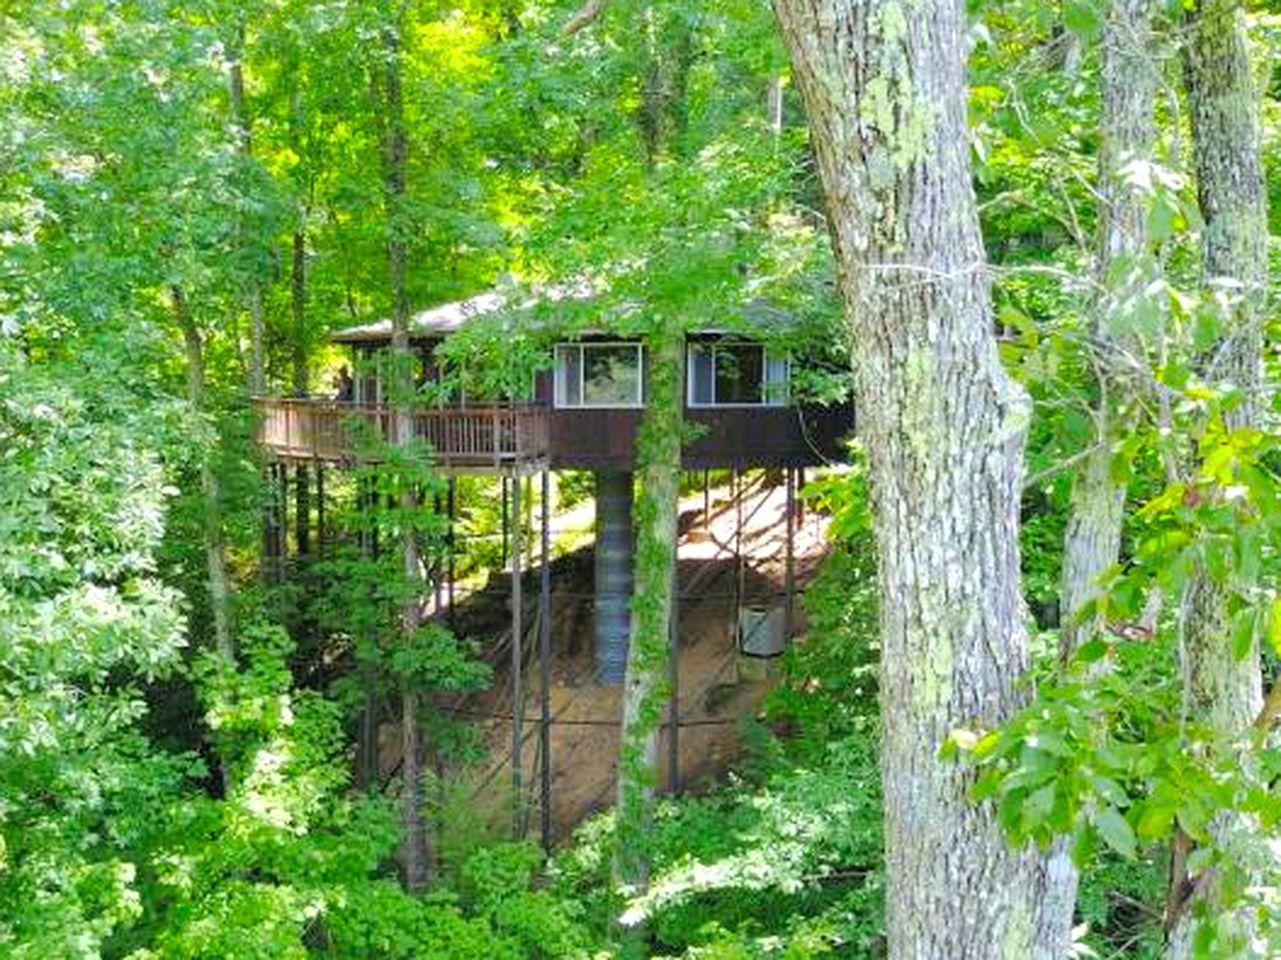 Amazing Tree House Rental near Cumberland Falls State Park, Kentucky